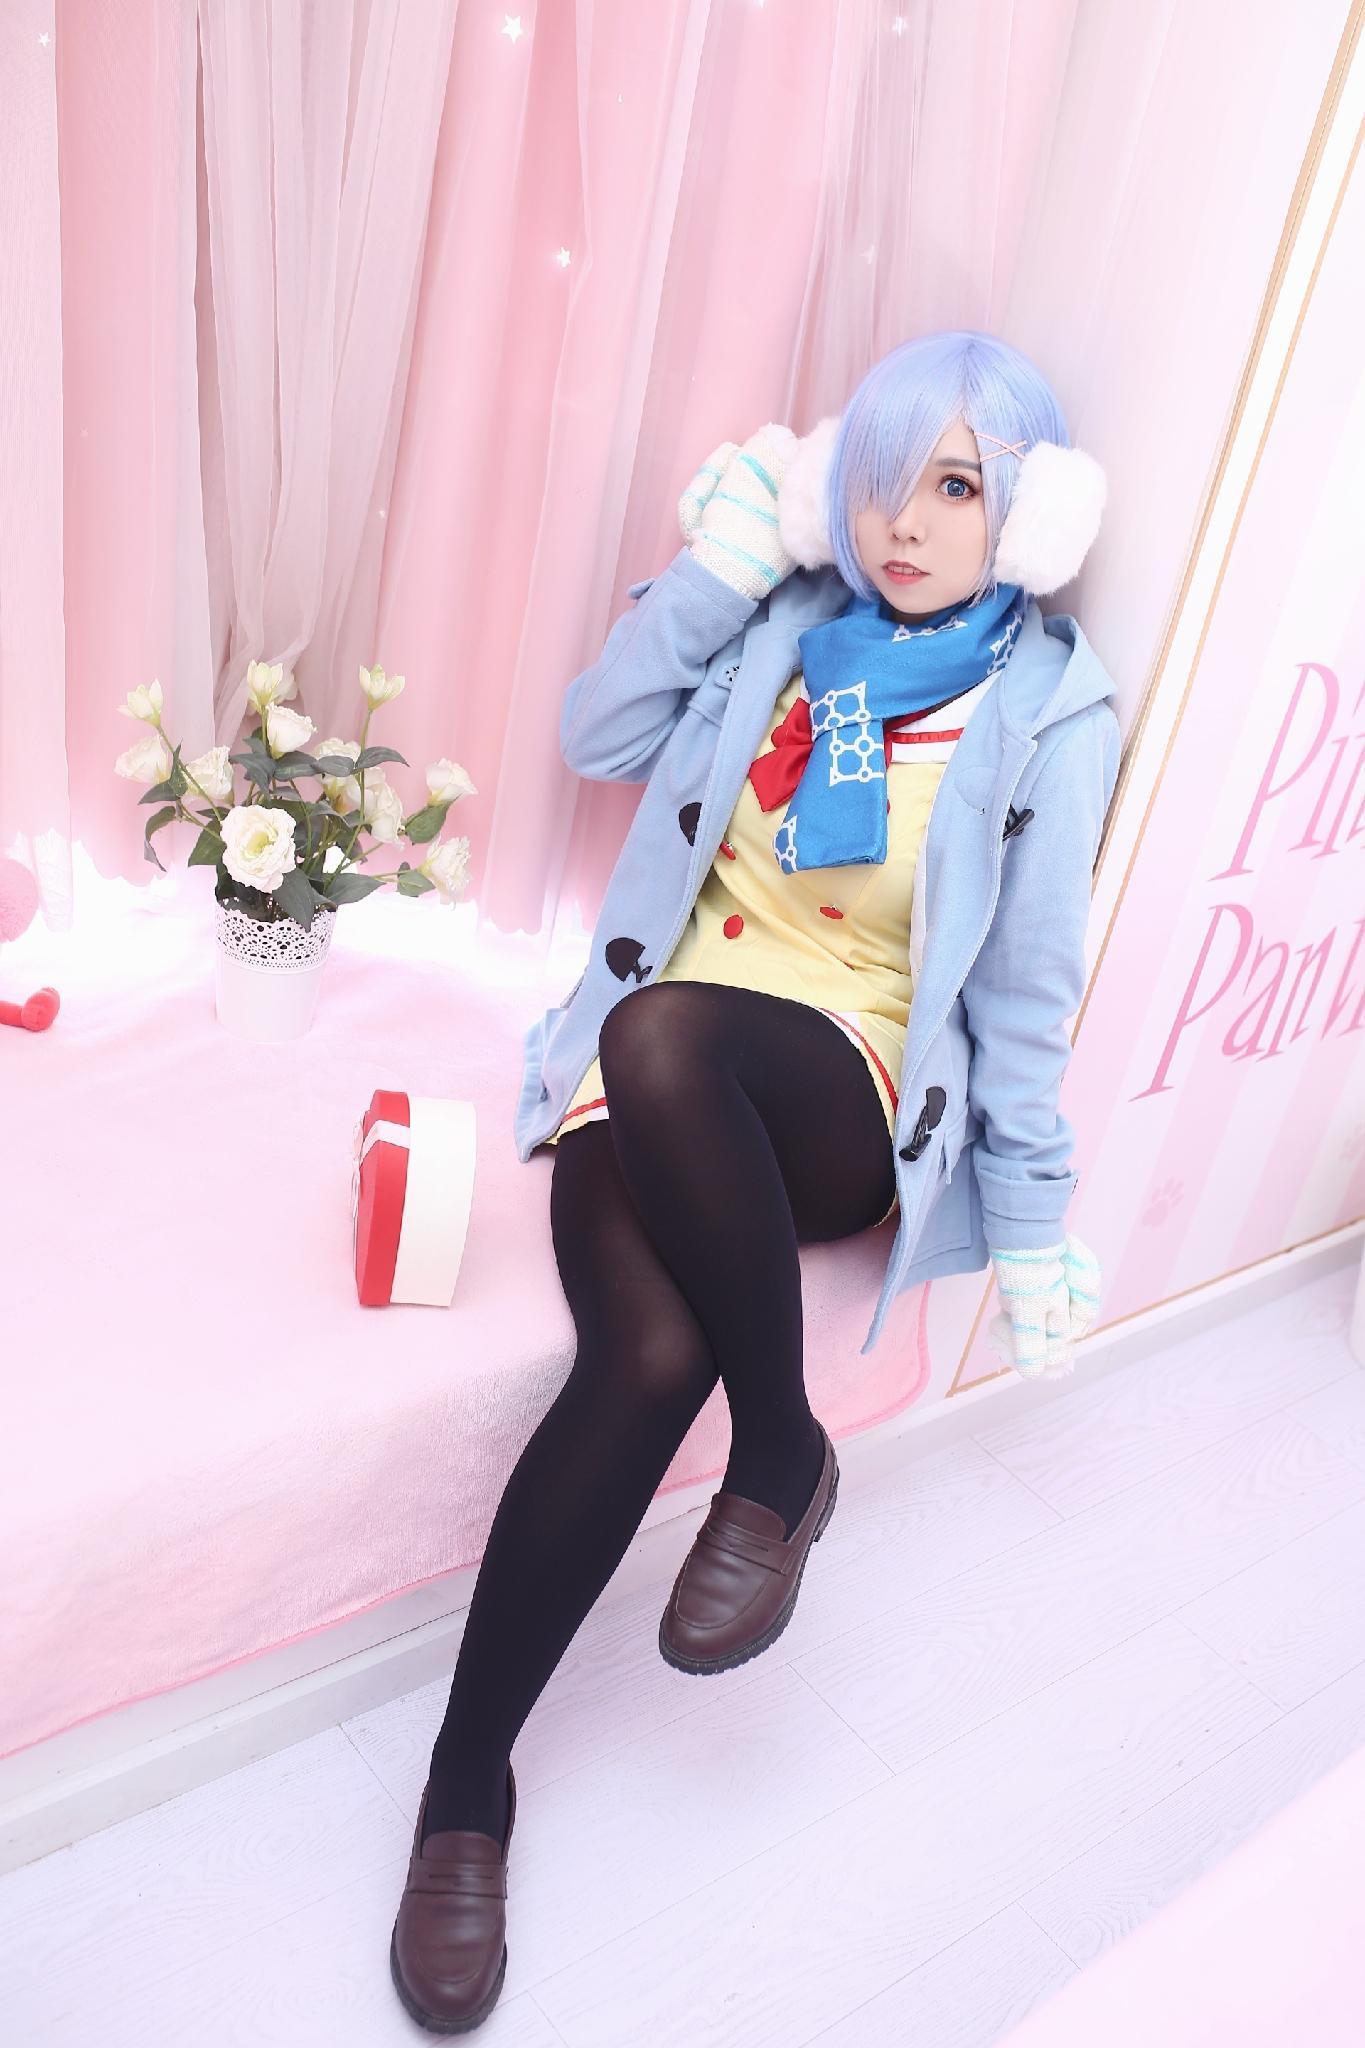 《RE:从零开始的异世界生活》萌妹cosplay【CN:得萨】-第1张